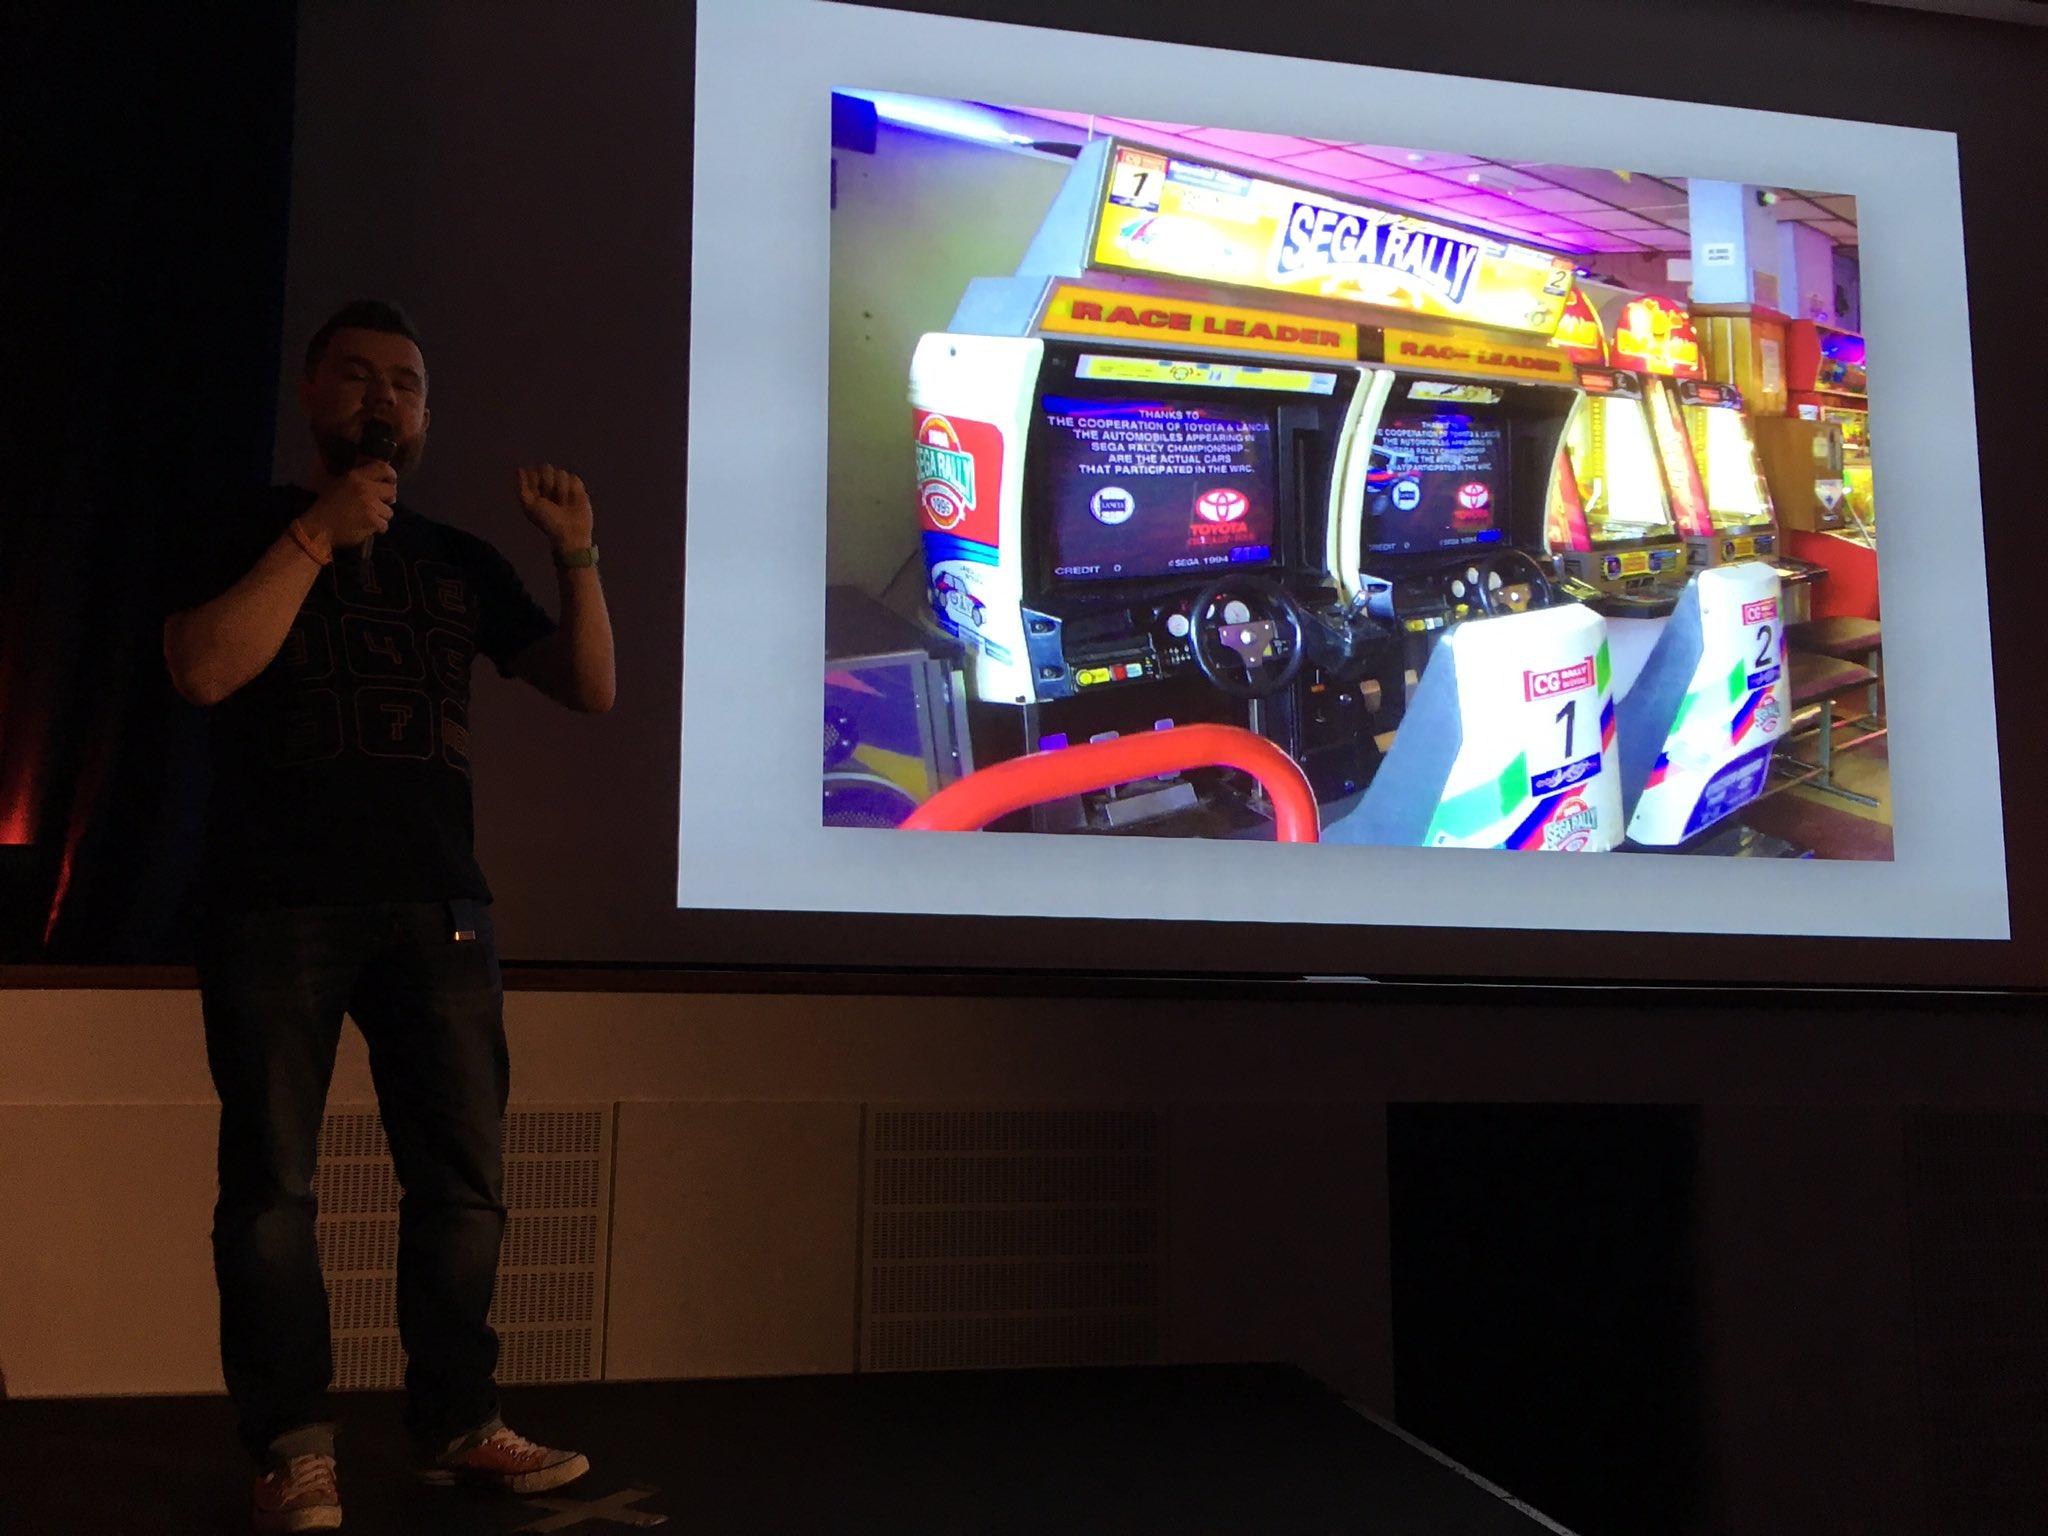 Danny Parker, Head of Mobile Technology, Ninja Kiwi talks 20 personal gaming memories, as our final speaker tonight! @mono_eric3 #GamesPK https://t.co/Ny3CXK7ZQE